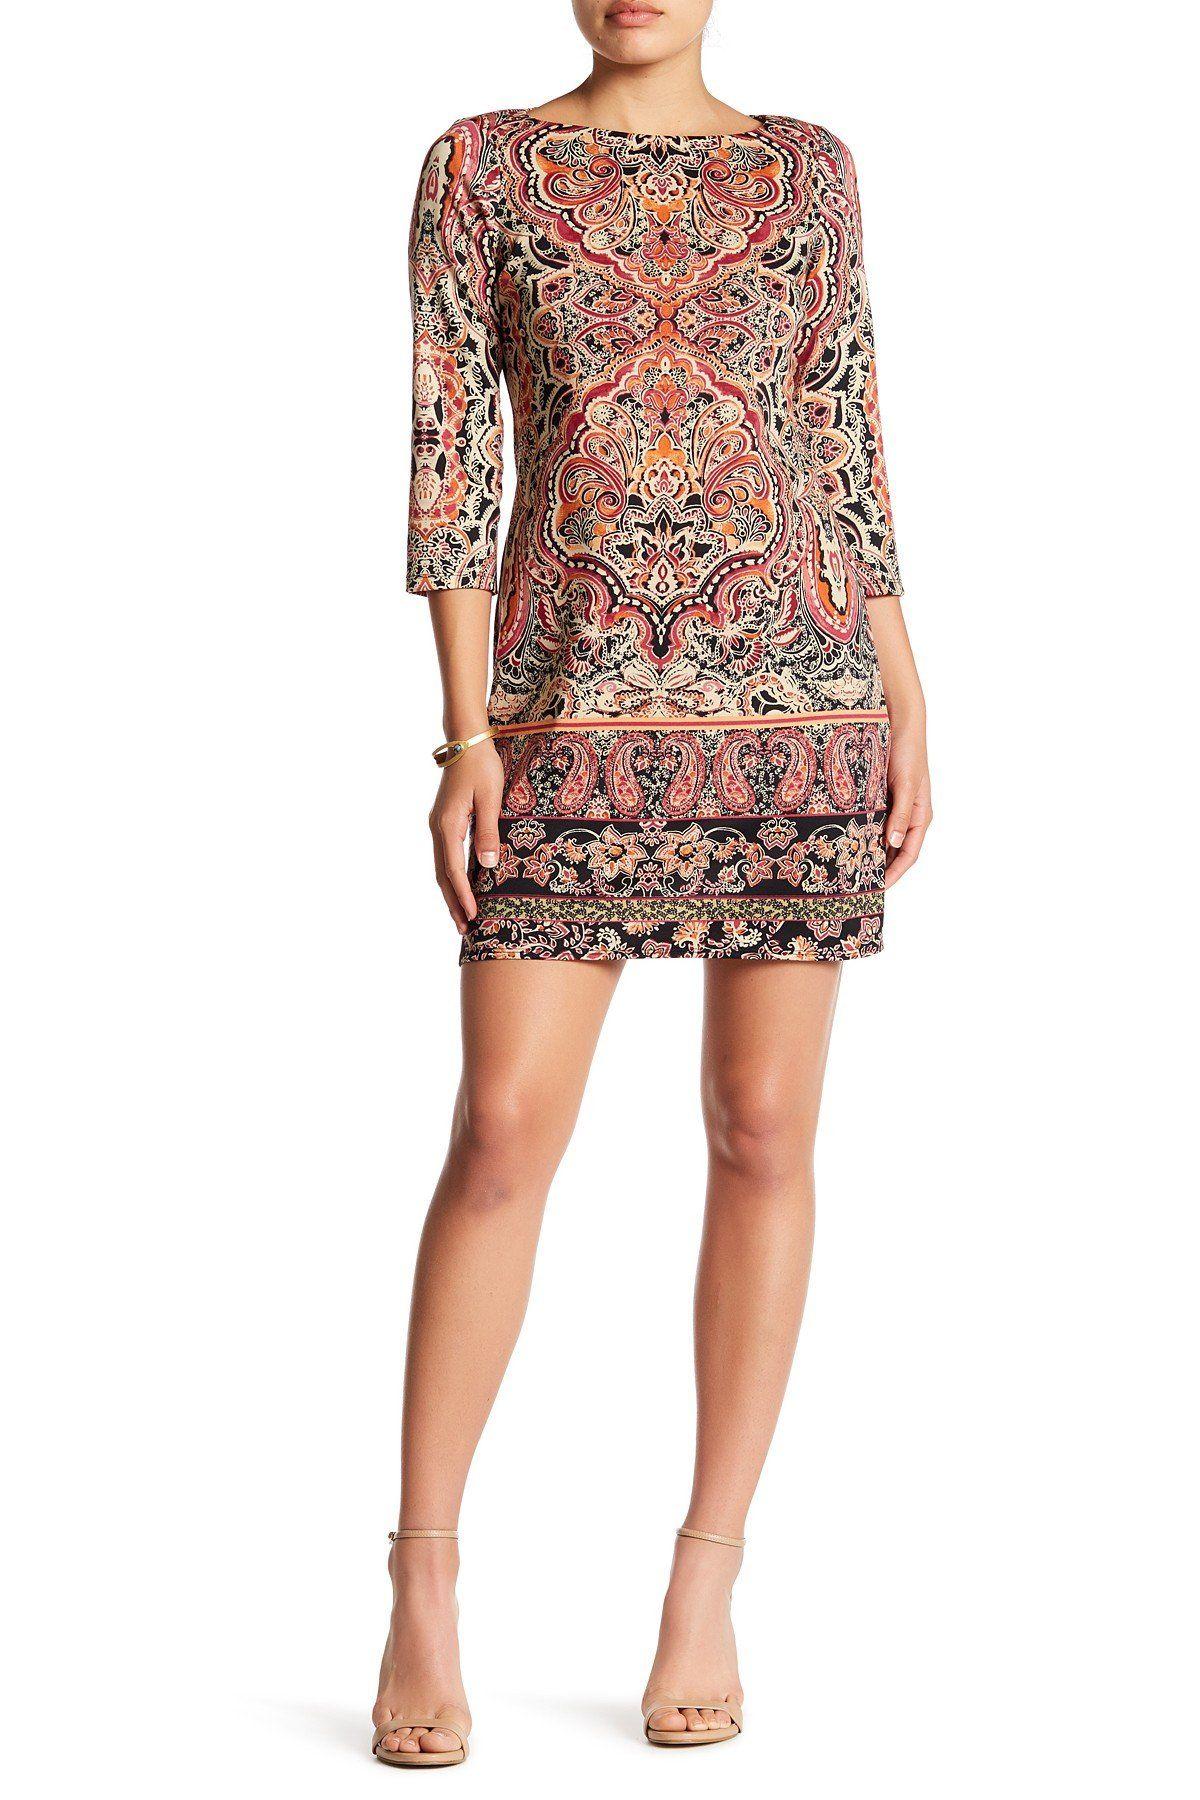 3/4 Length Sleeve Paisley Print Dress (Petite)